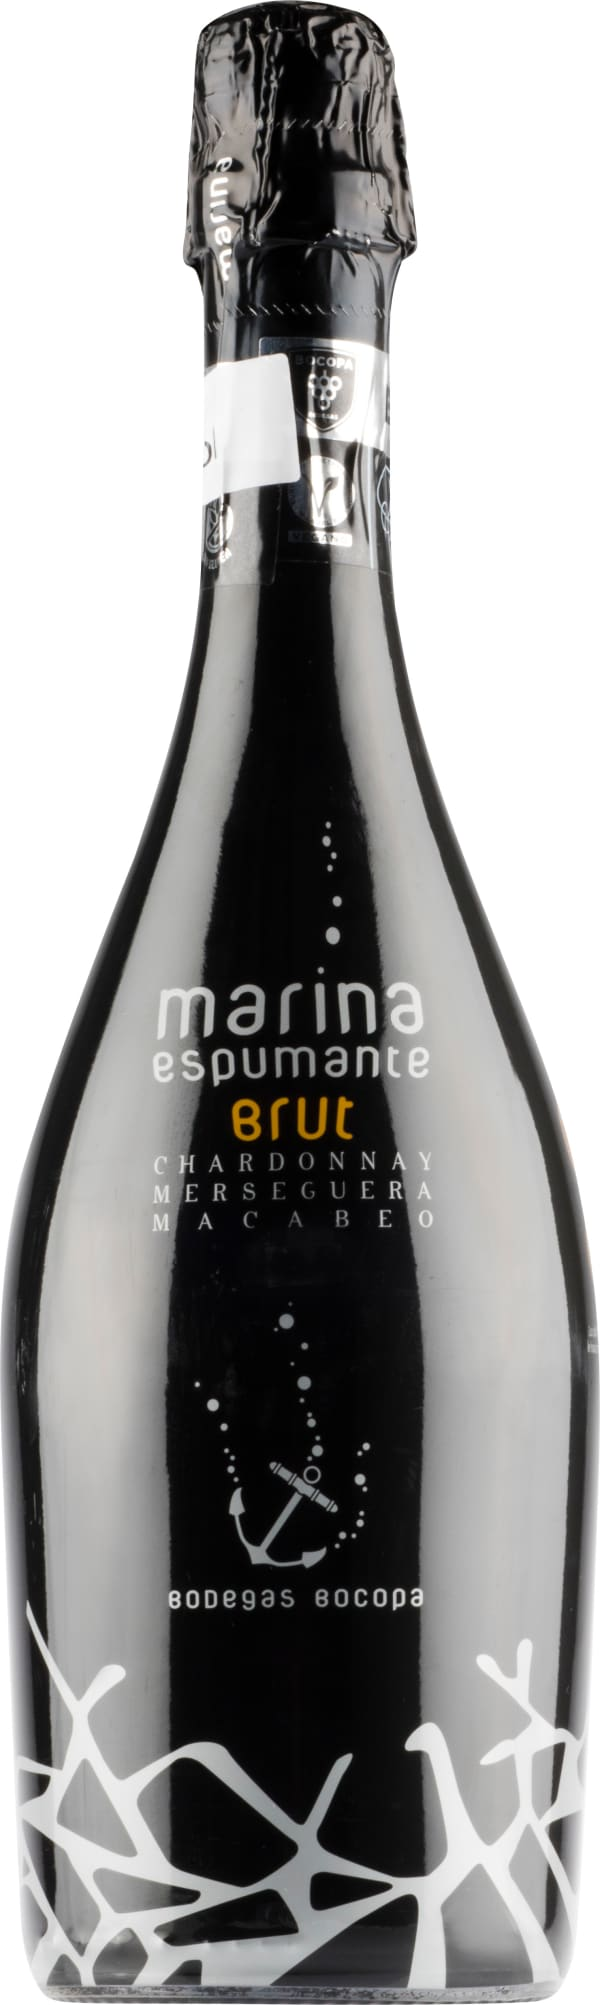 Marina Espumante Brut